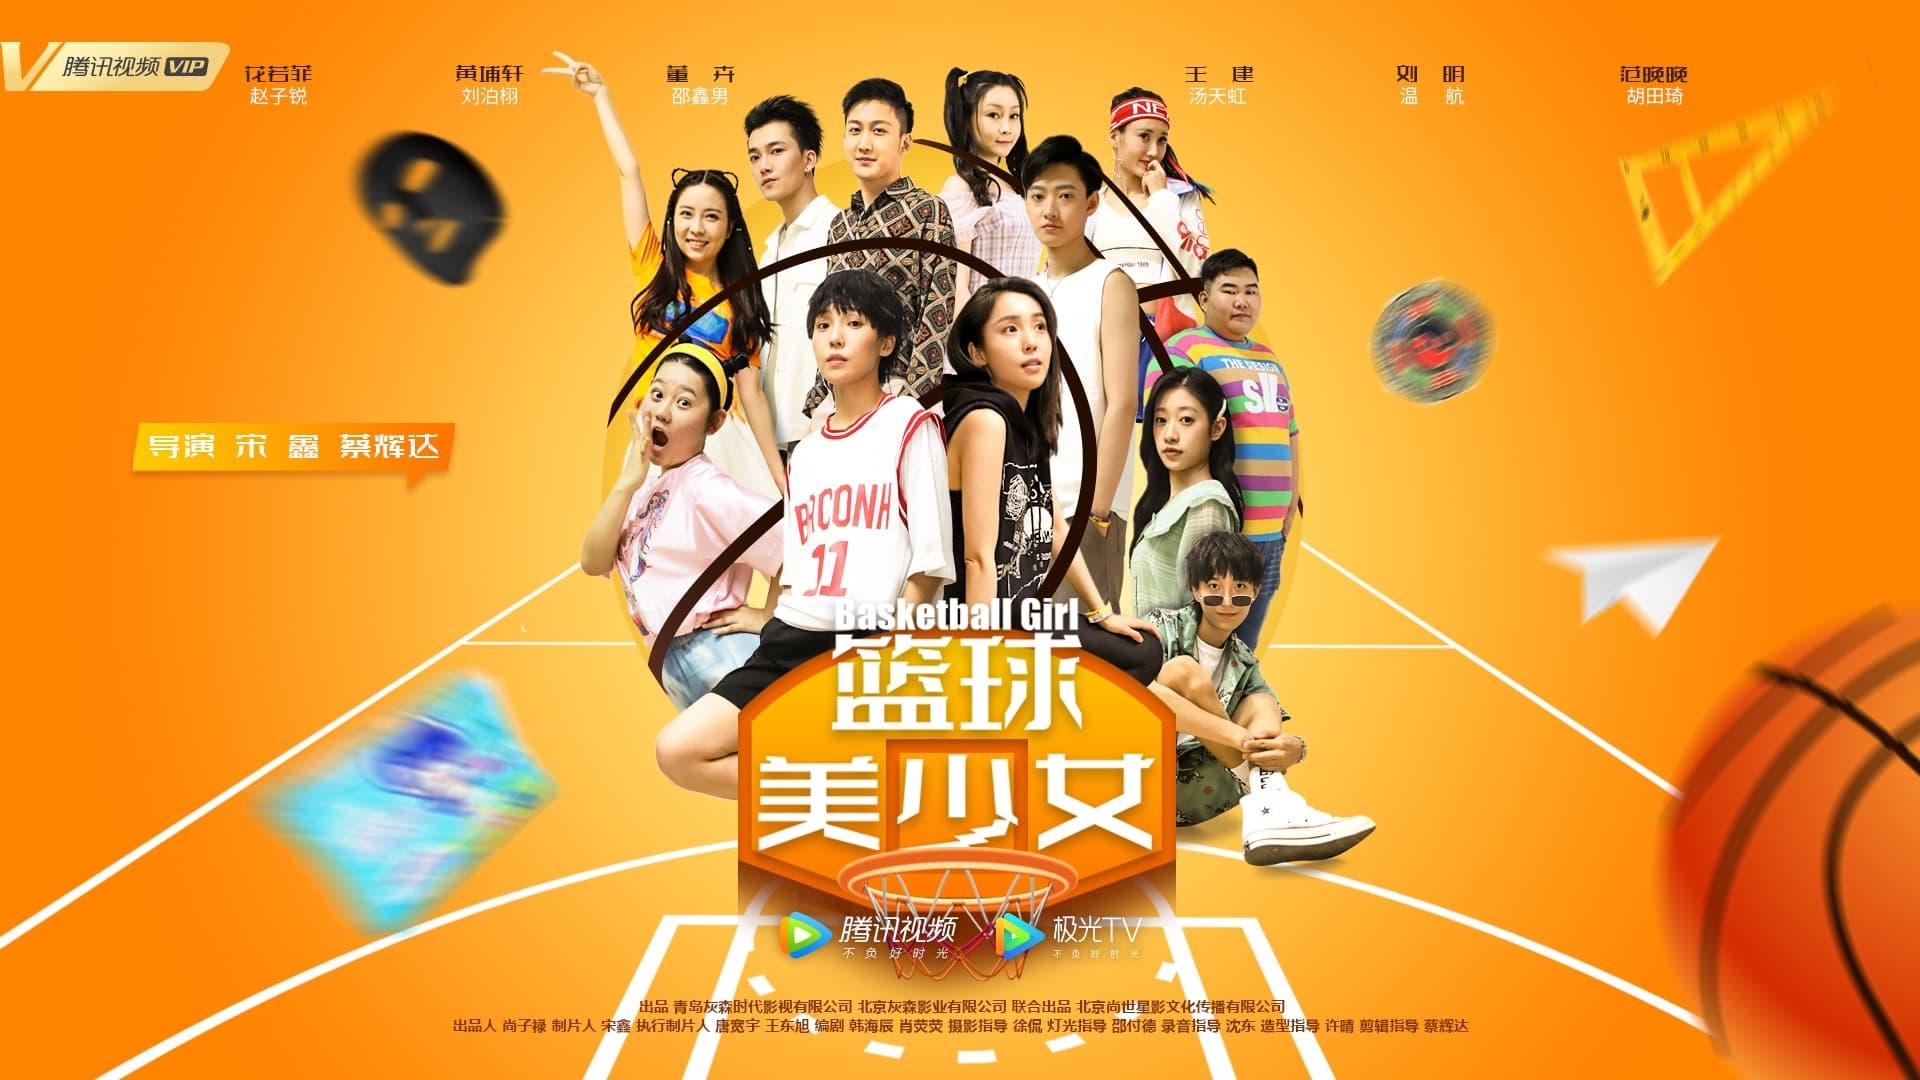 篮球美少女 (2021) Movie English Full Movie Watch Online